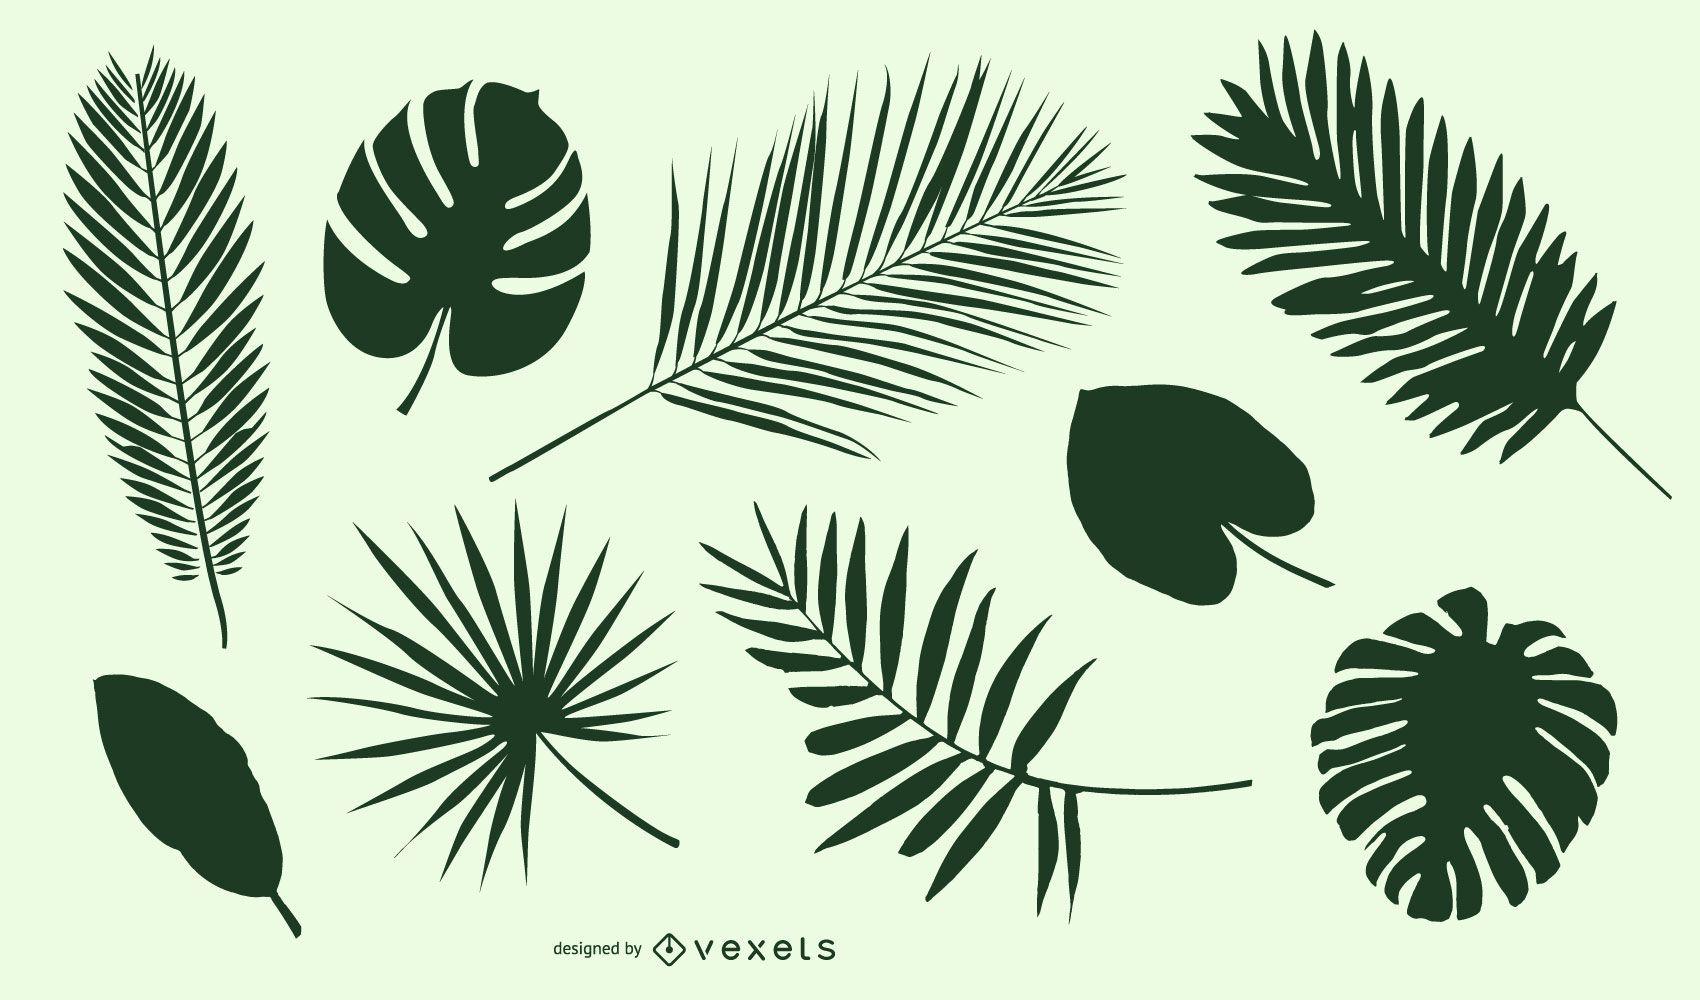 Leaf and leaves silhouette set